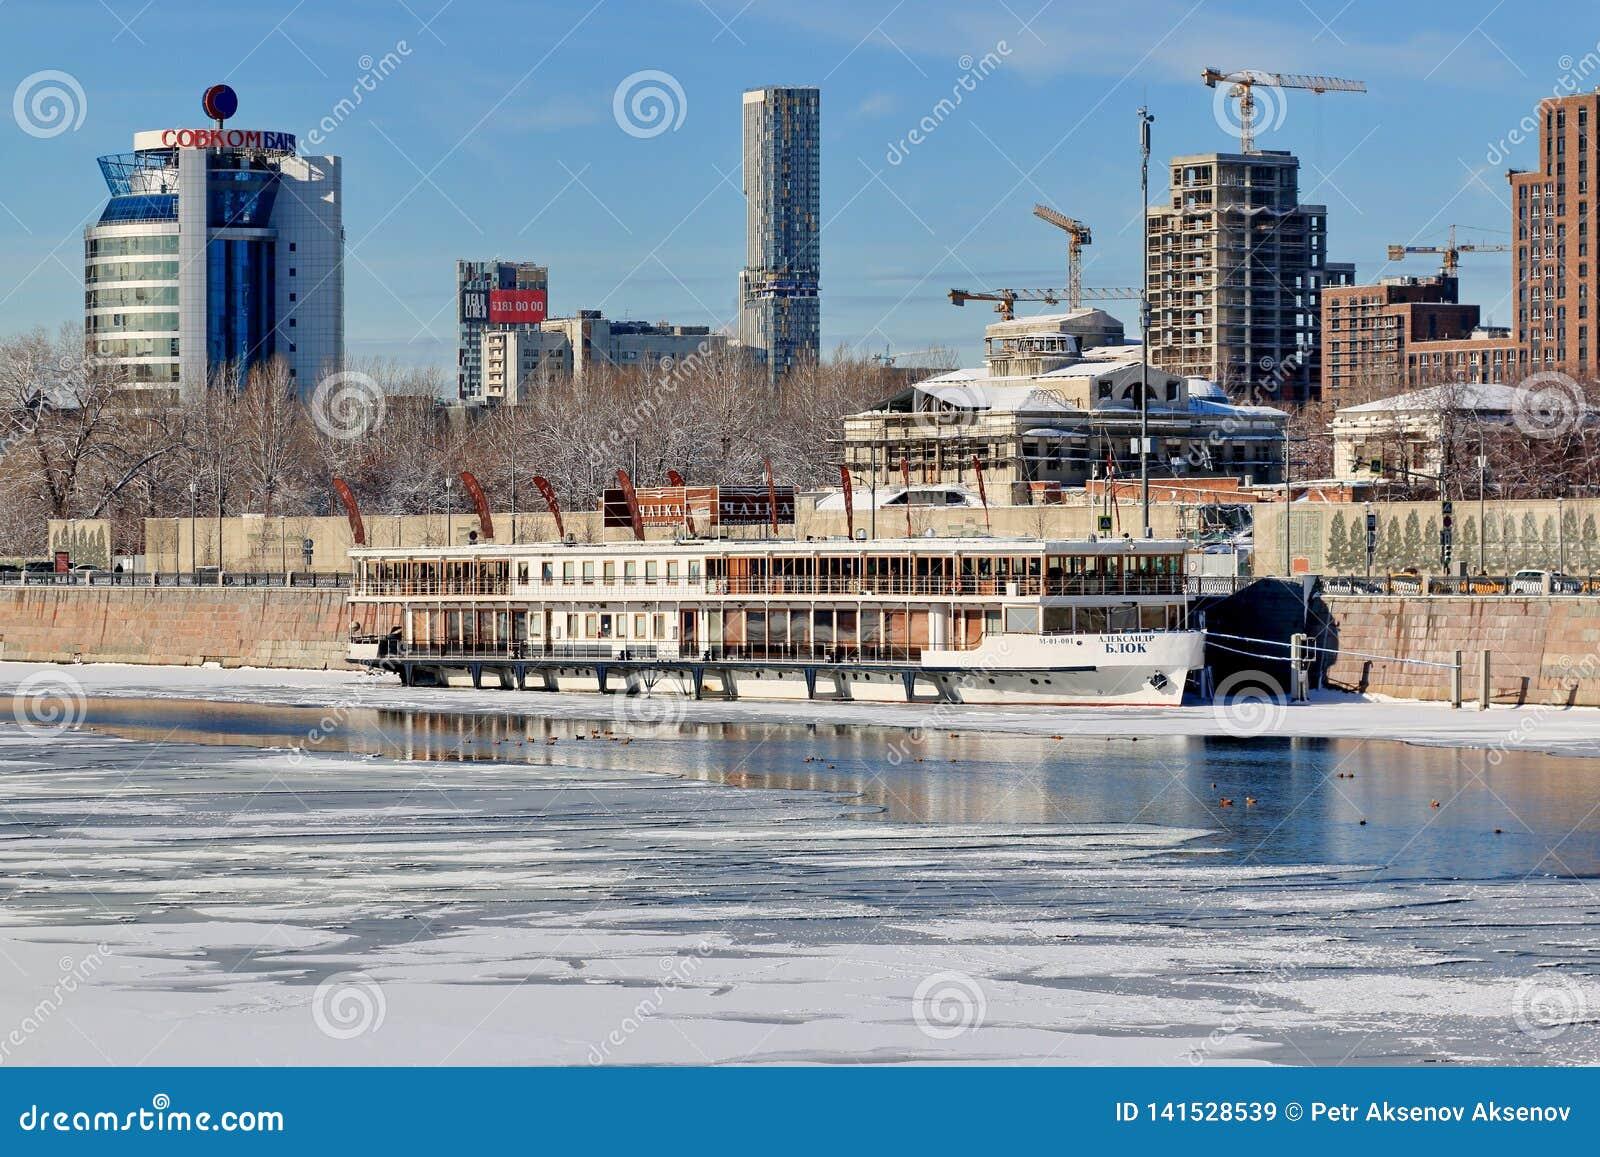 Moscou, Russie - 14 février 2019 : La vie de Moscou Remblai de Krasnopresnenskaya